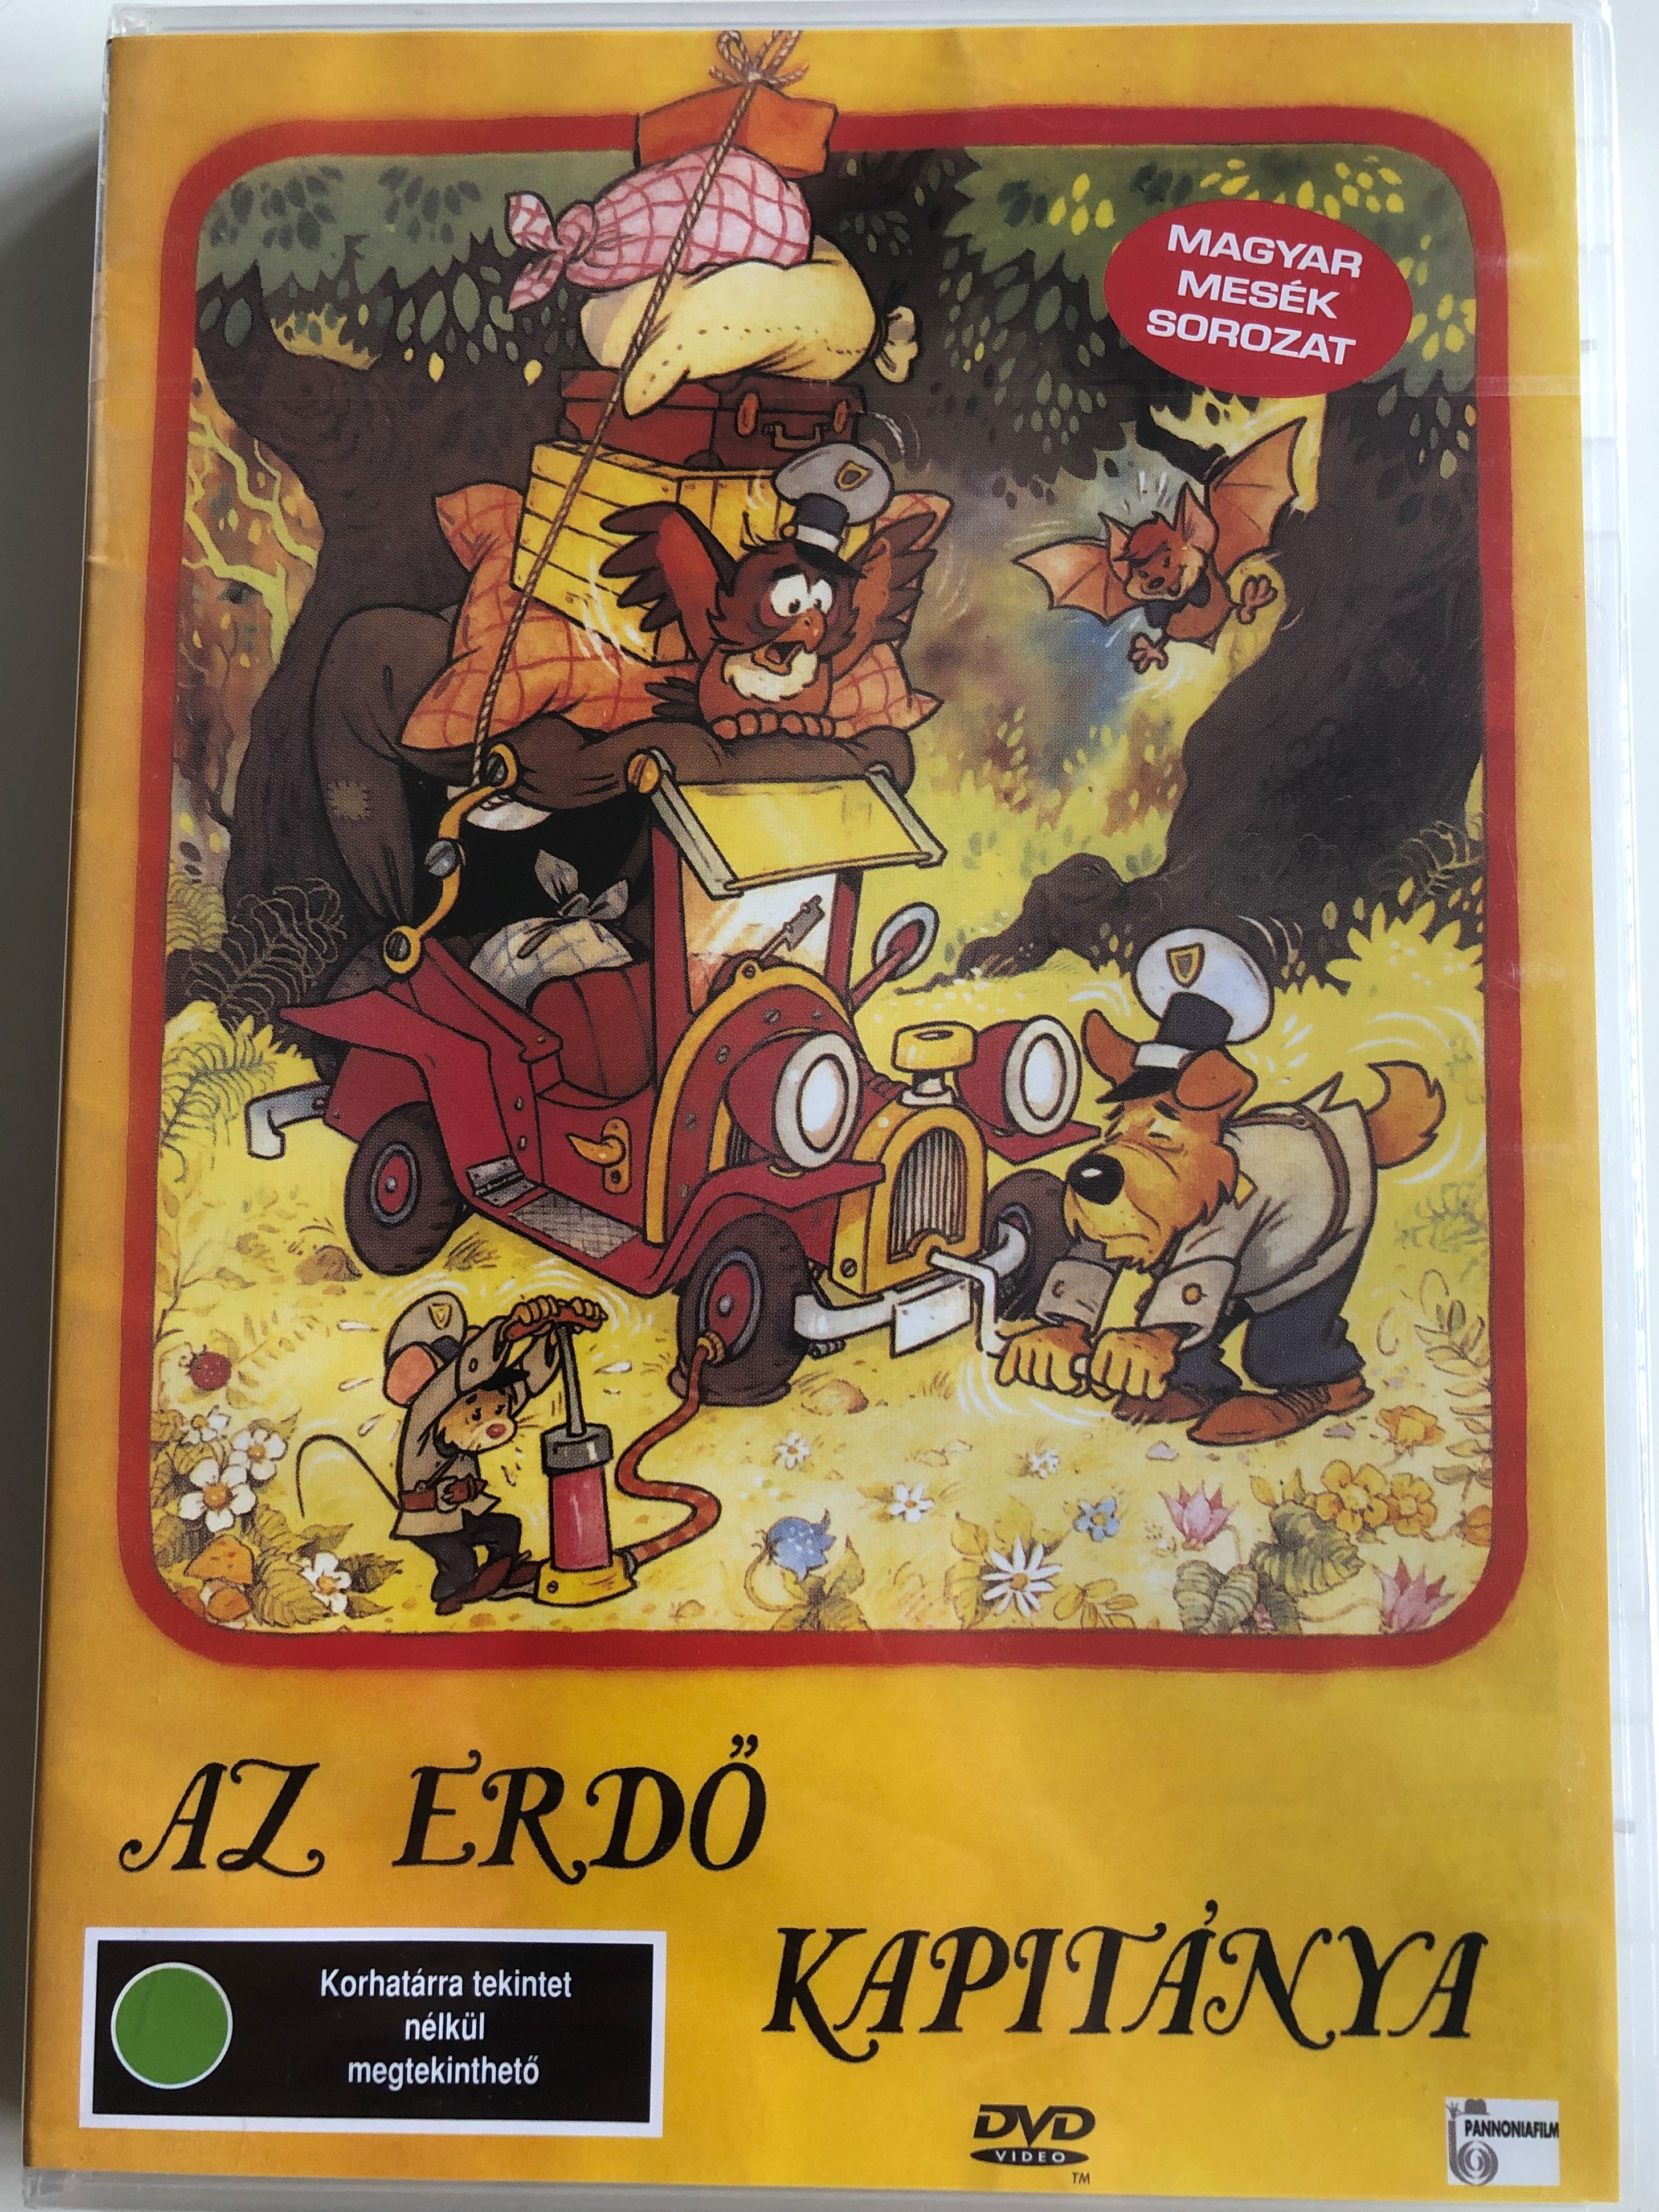 az-erd-kapit-nya-dvd-1988-directed-by-dargay-attila-1.jpg